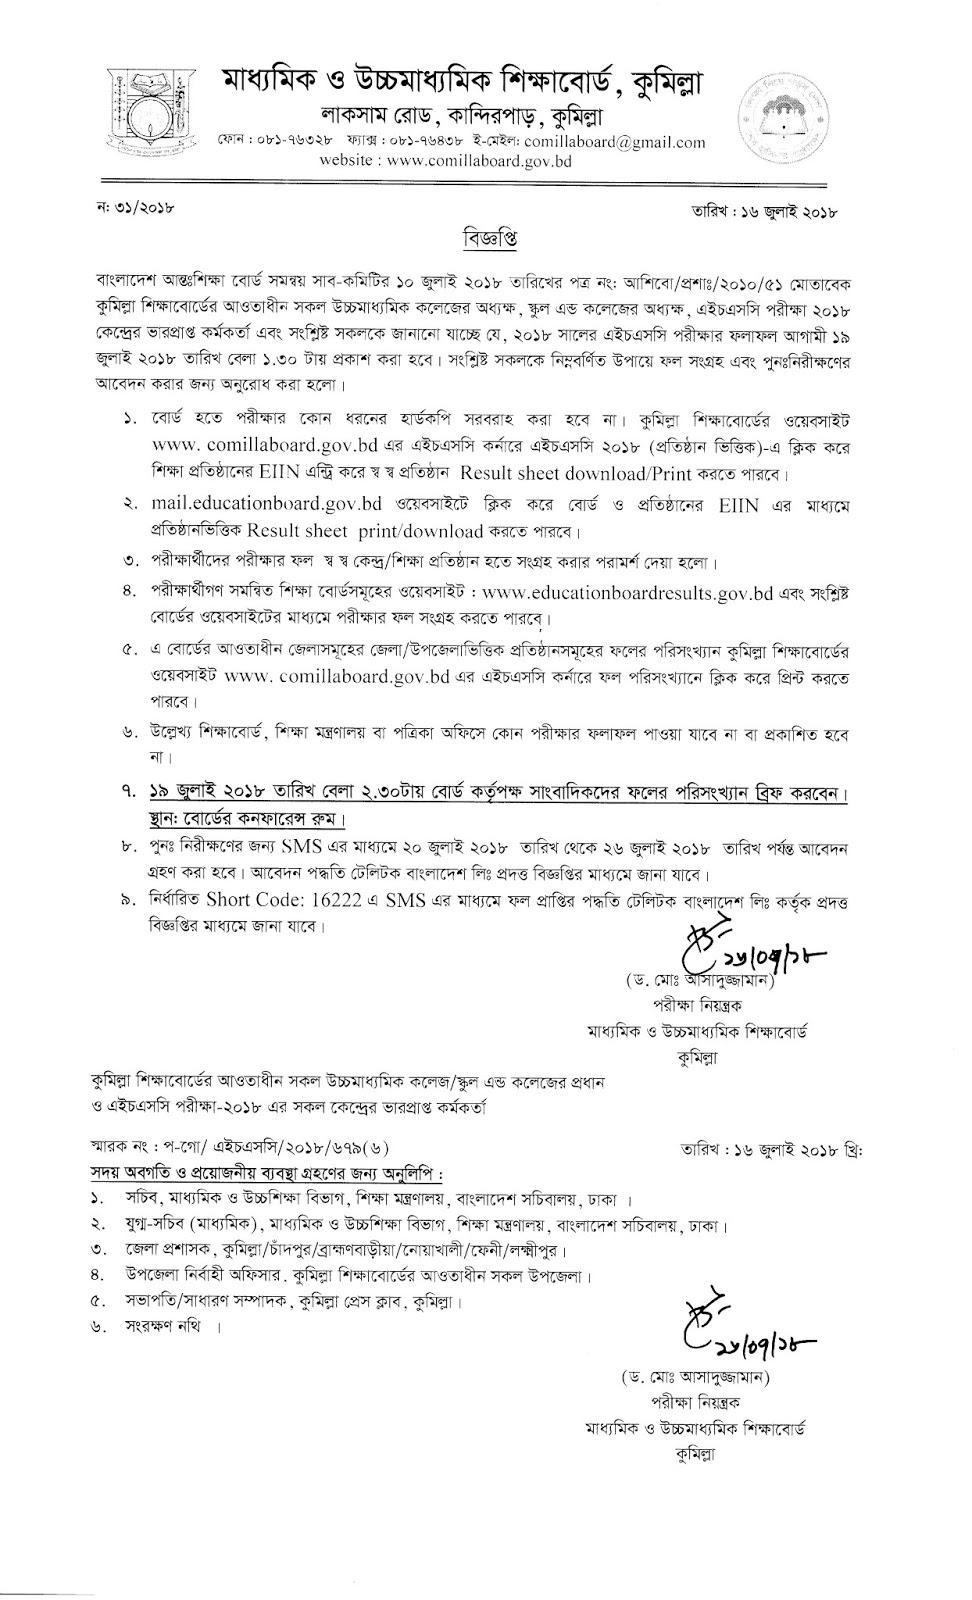 HSC/Alim Examination Result 2018 Notice